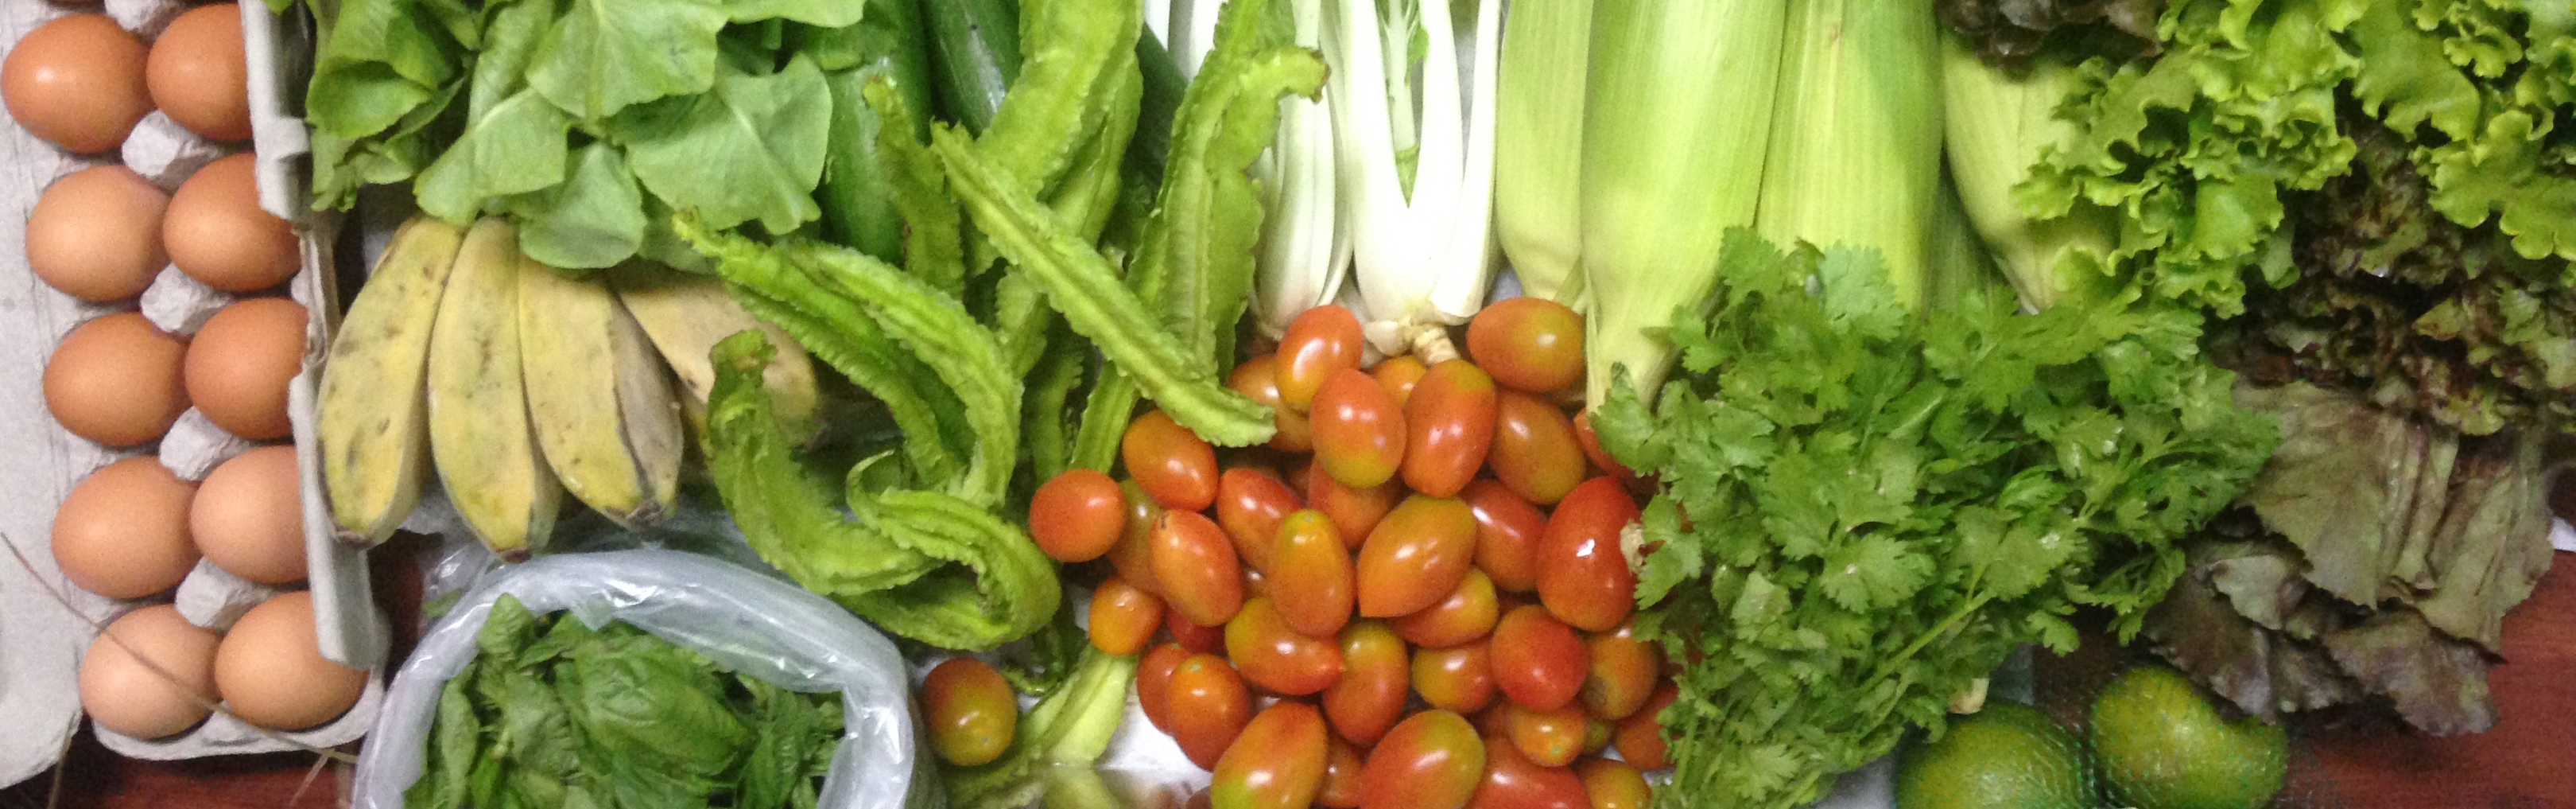 CSA Produce